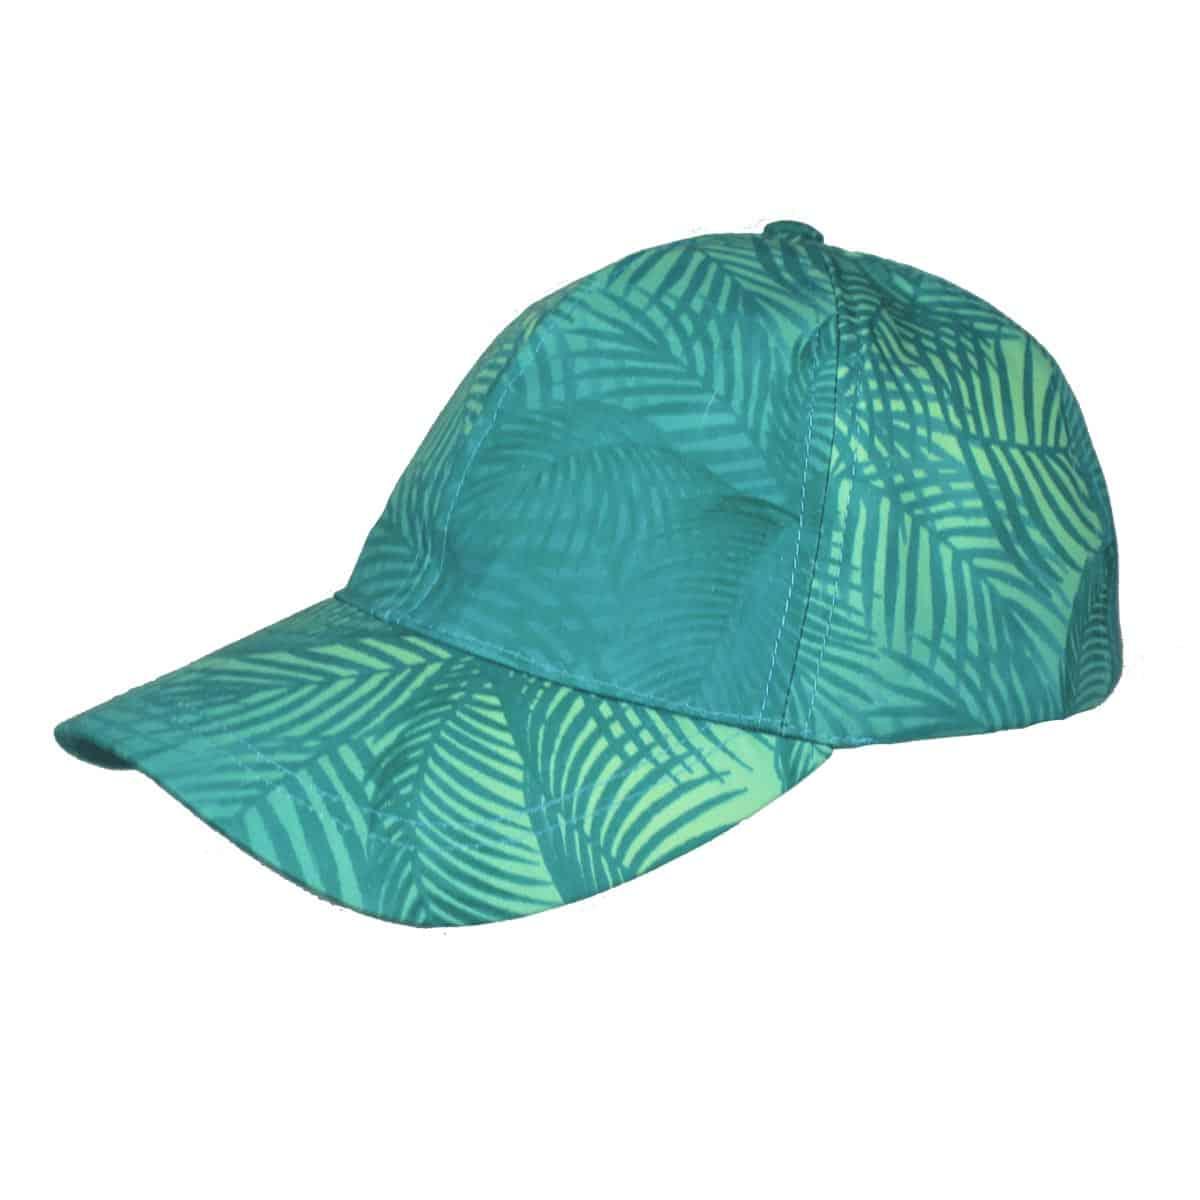 palmasverdescap pgc1260 grn 1